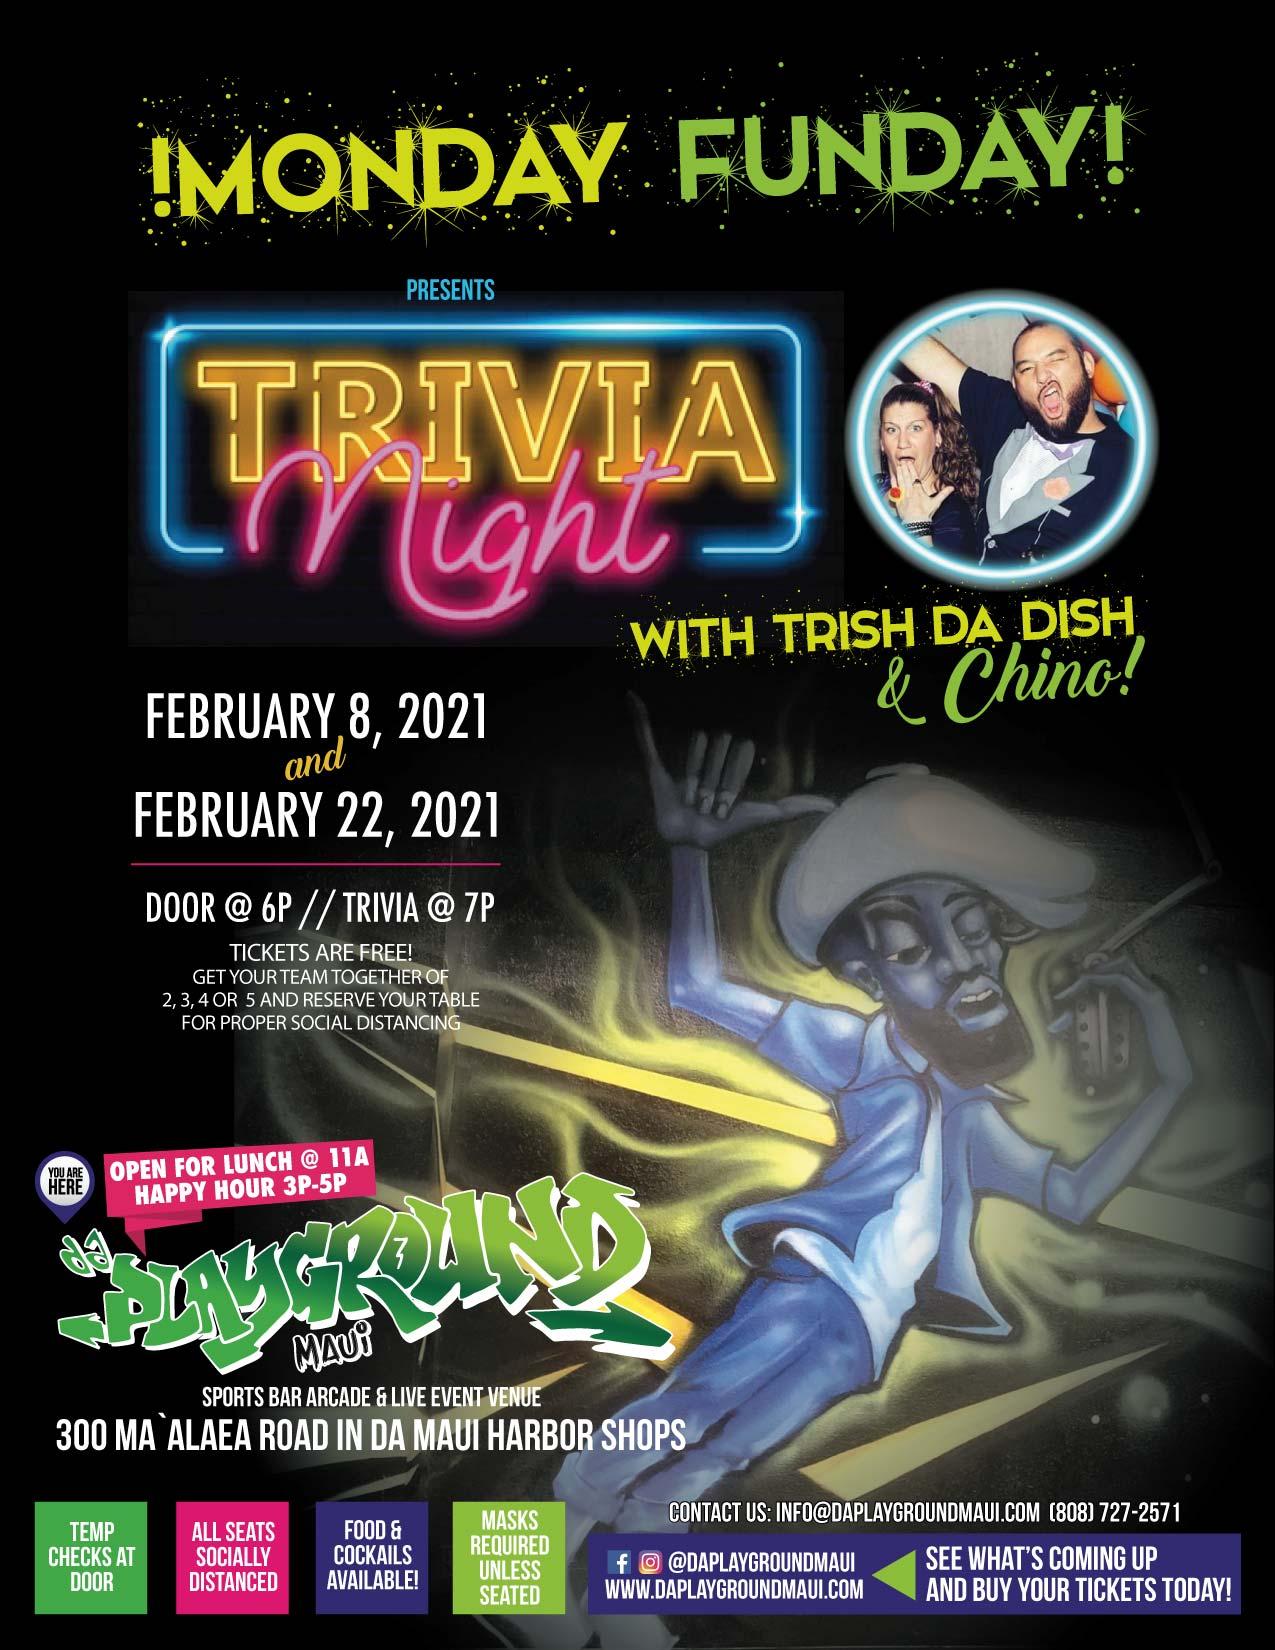 !Monday Funday! Trivia Night with Trish da Dish and Chino at da playground maui!